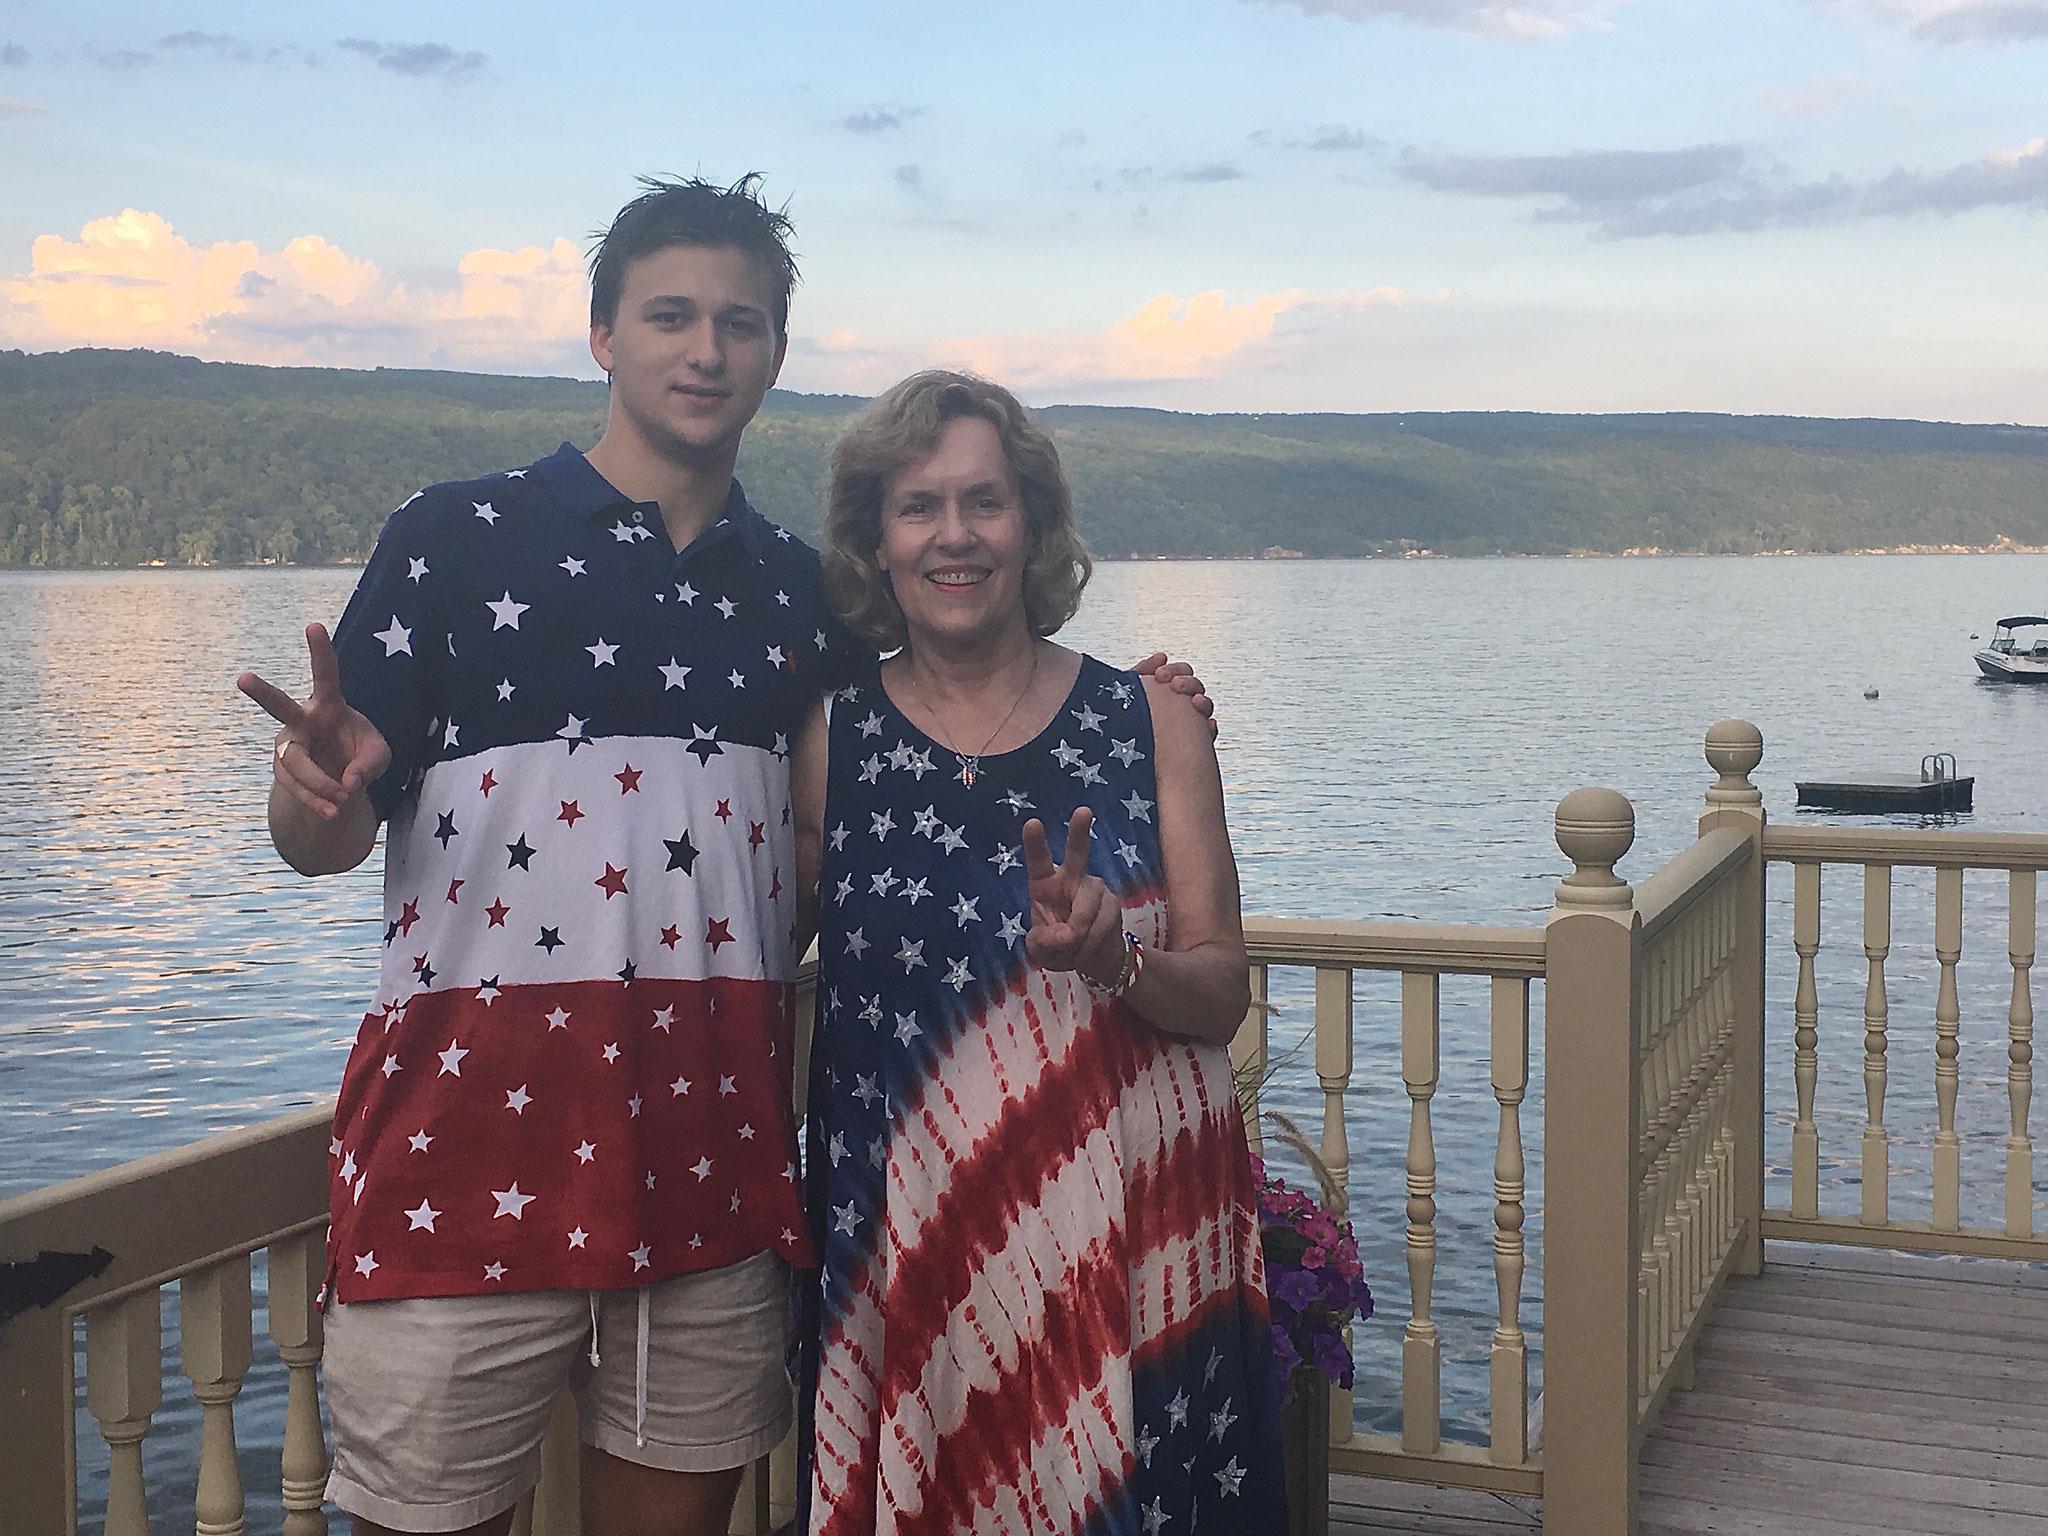 Jack & Lorraine, July 4th, 2019